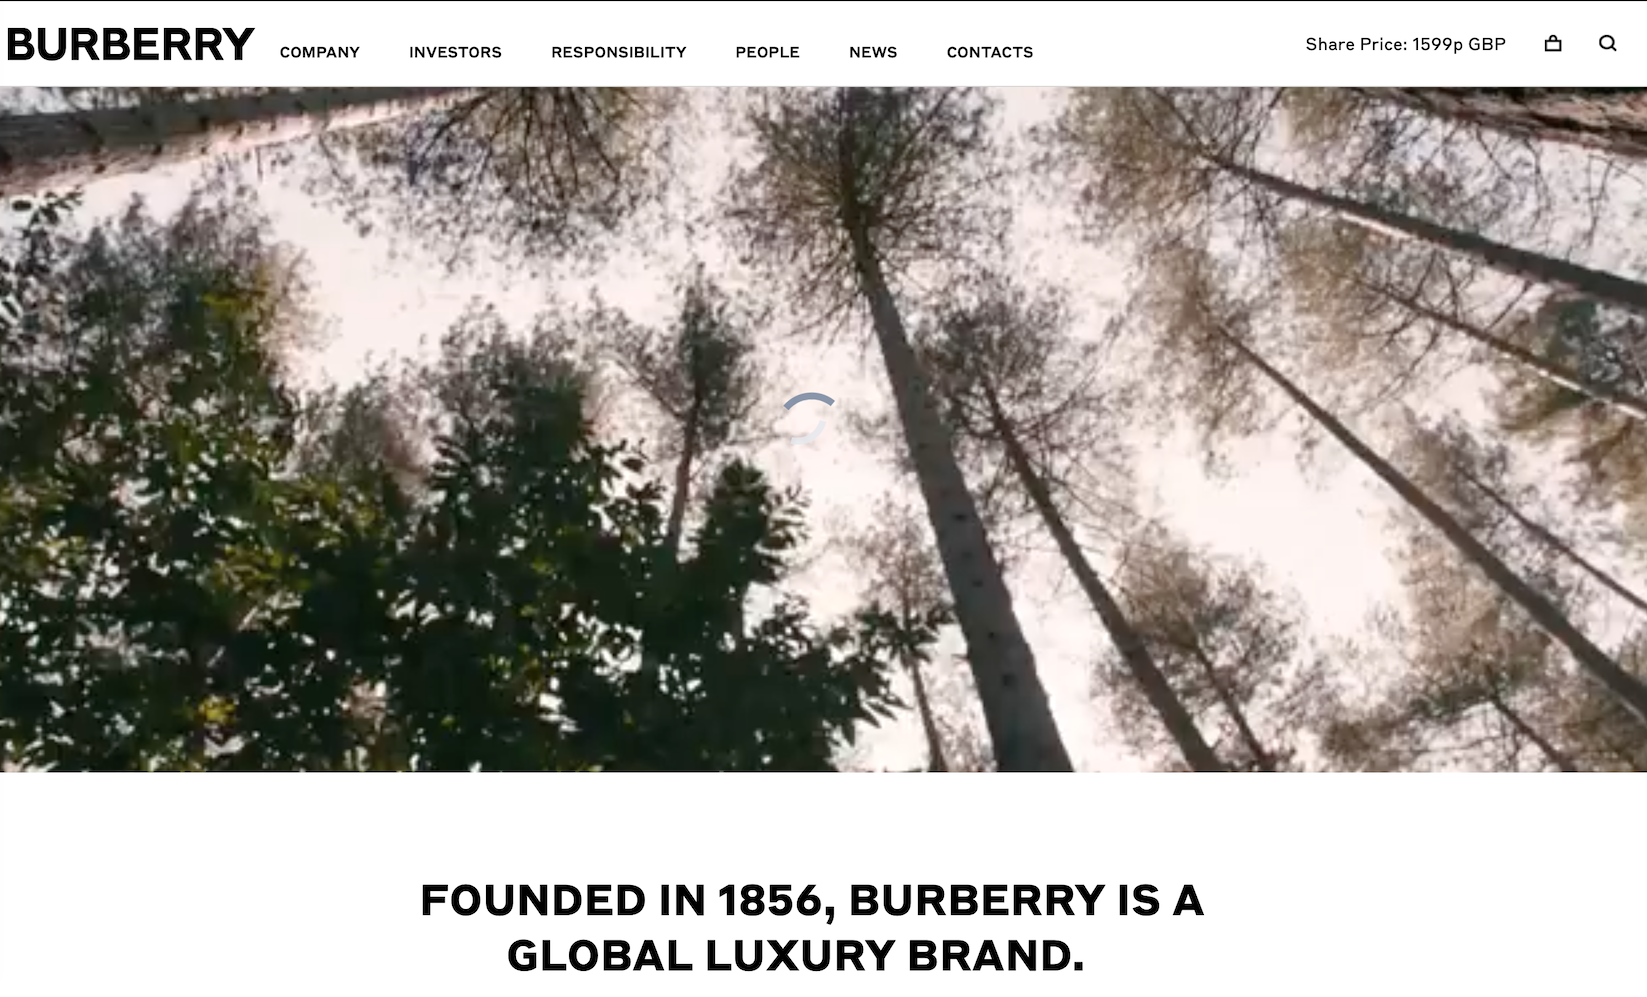 Burberry 为 IBM 实习生项目提供指导,提高时尚产品供应链的可追溯性